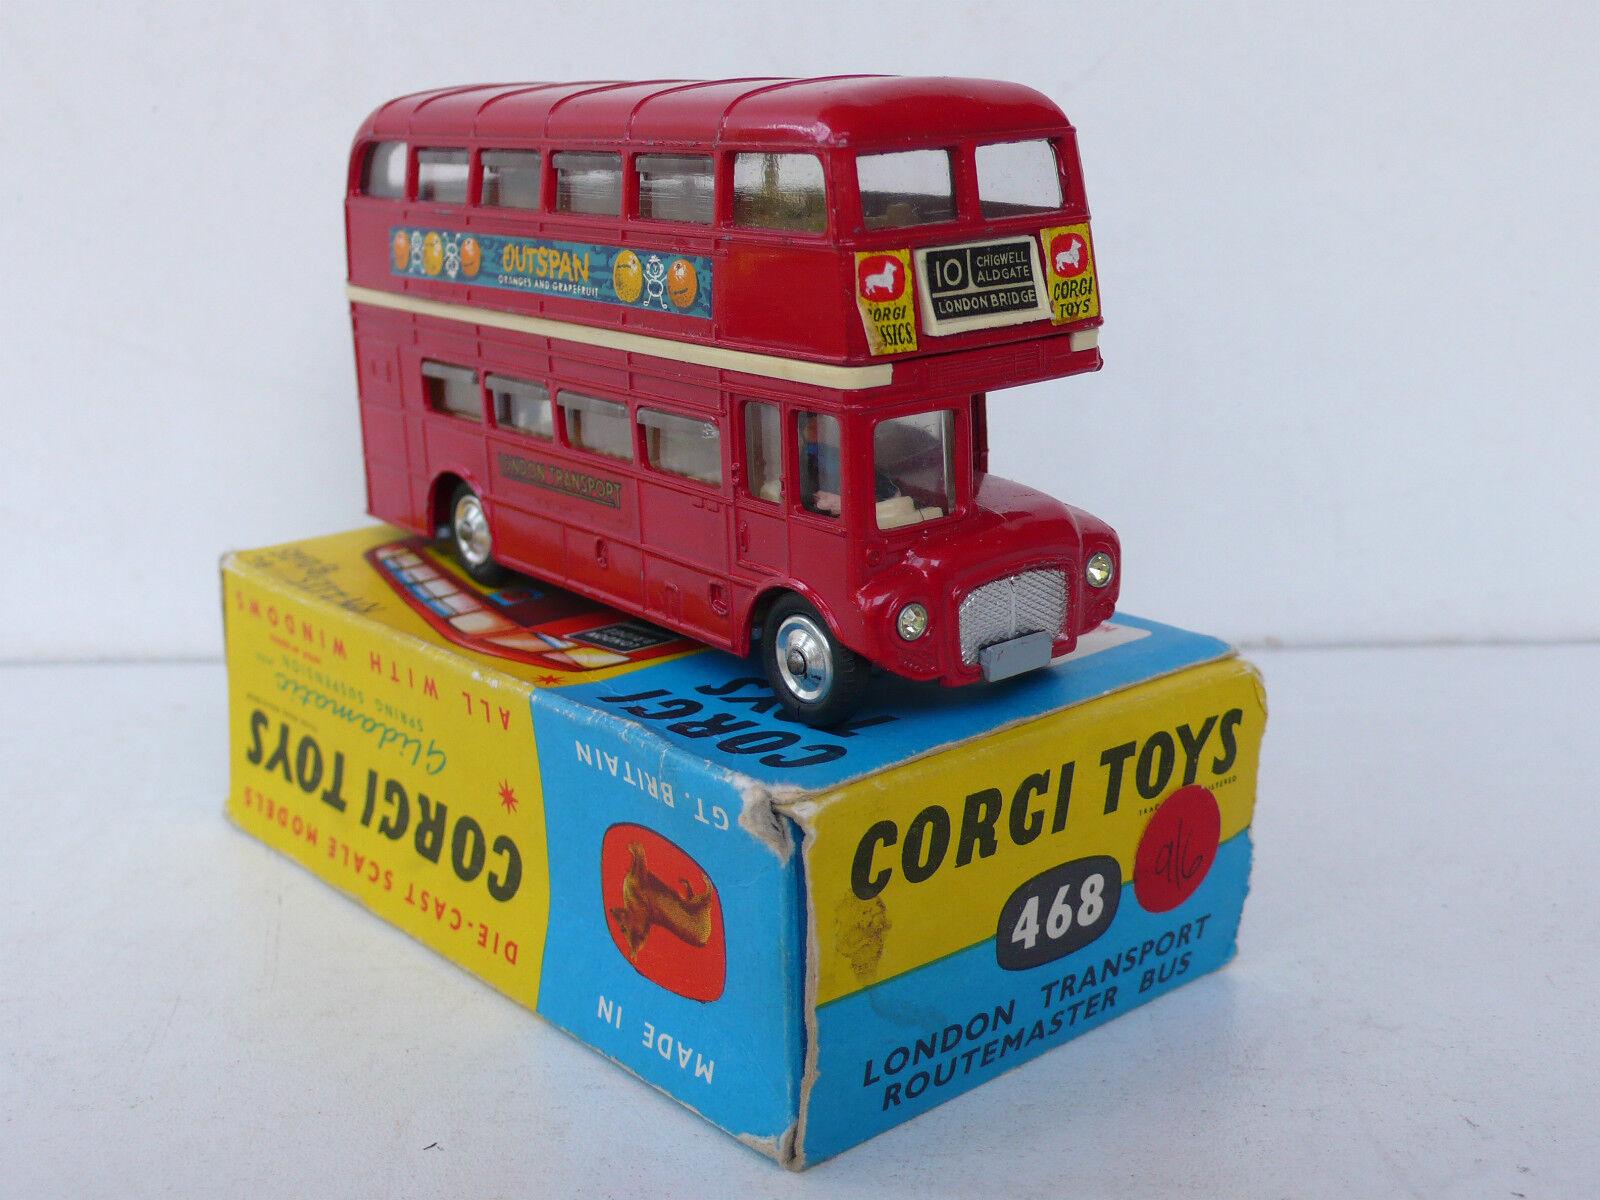 CORGI  TOYS  LONDON TRANSPORT ROUTEMASTER BUS   REF 468  TRÈS BON ÉTAT  BOITE D'O  magasin d'usine